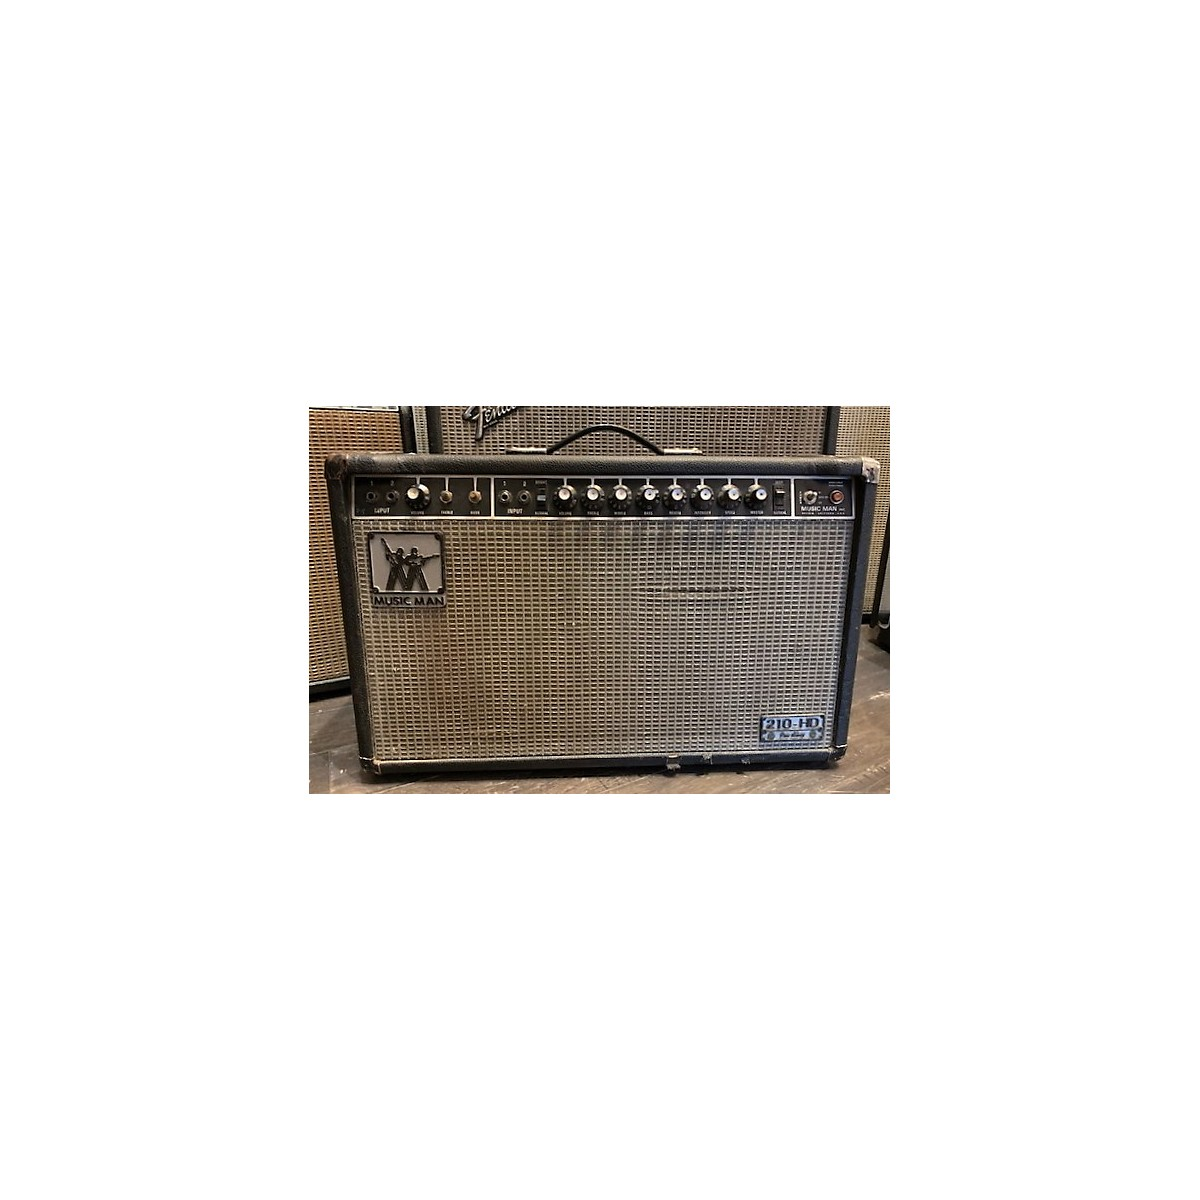 Ernie Ball Music Man 1970s 210 HD-130 Tube Guitar Combo Amp